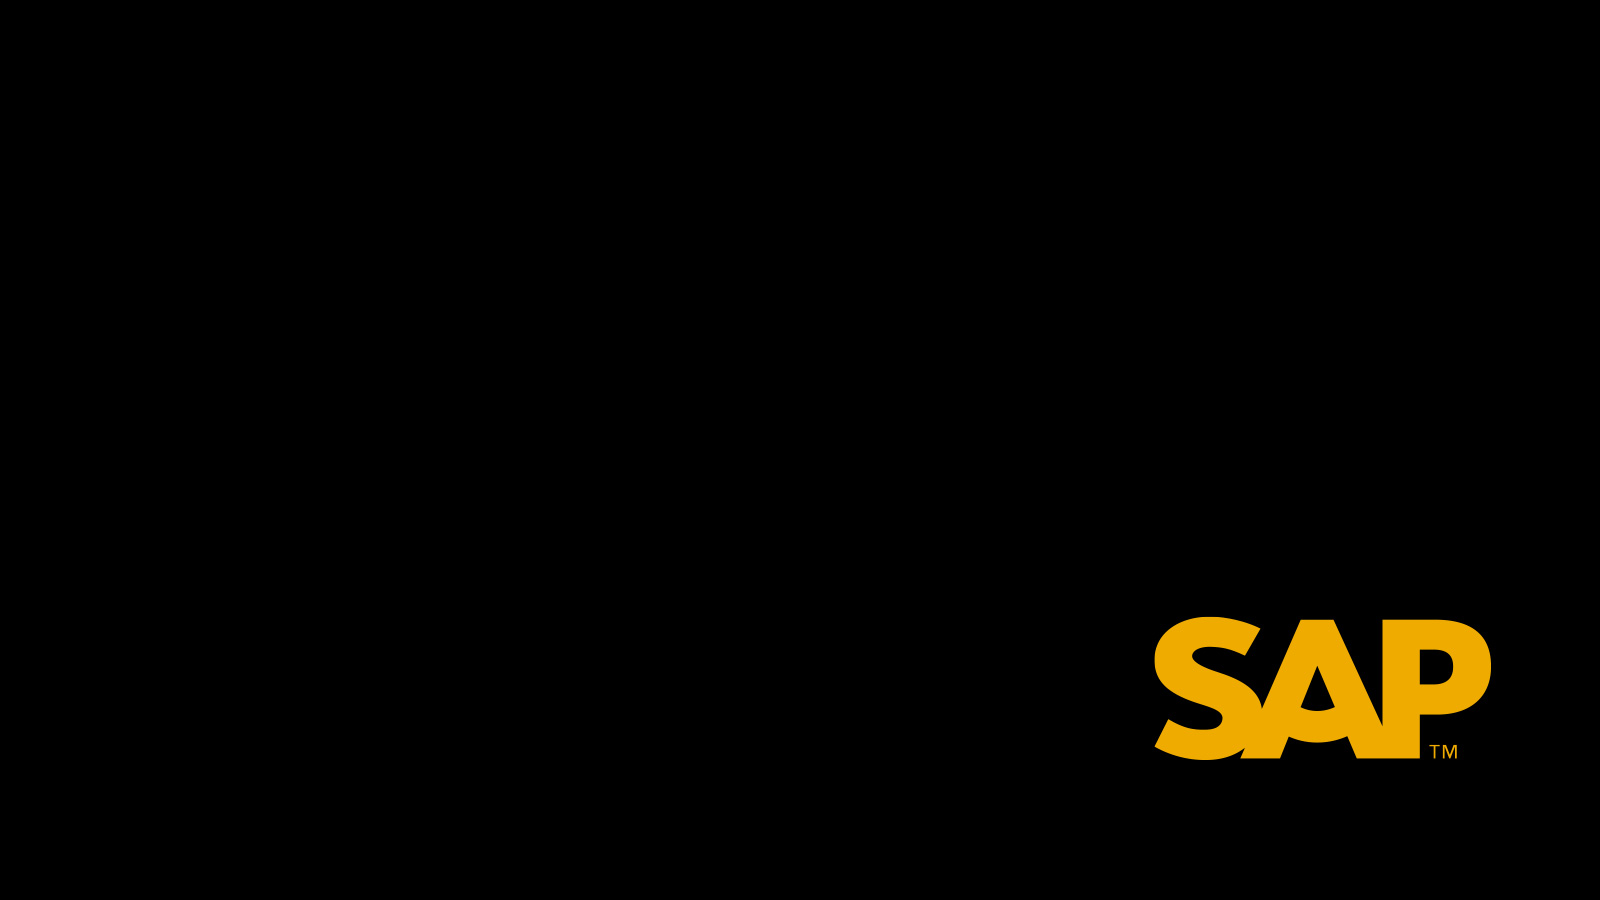 Best 53 SAP Background on HipWallpaper Rip ASAP Yams Wallpaper 1600x900